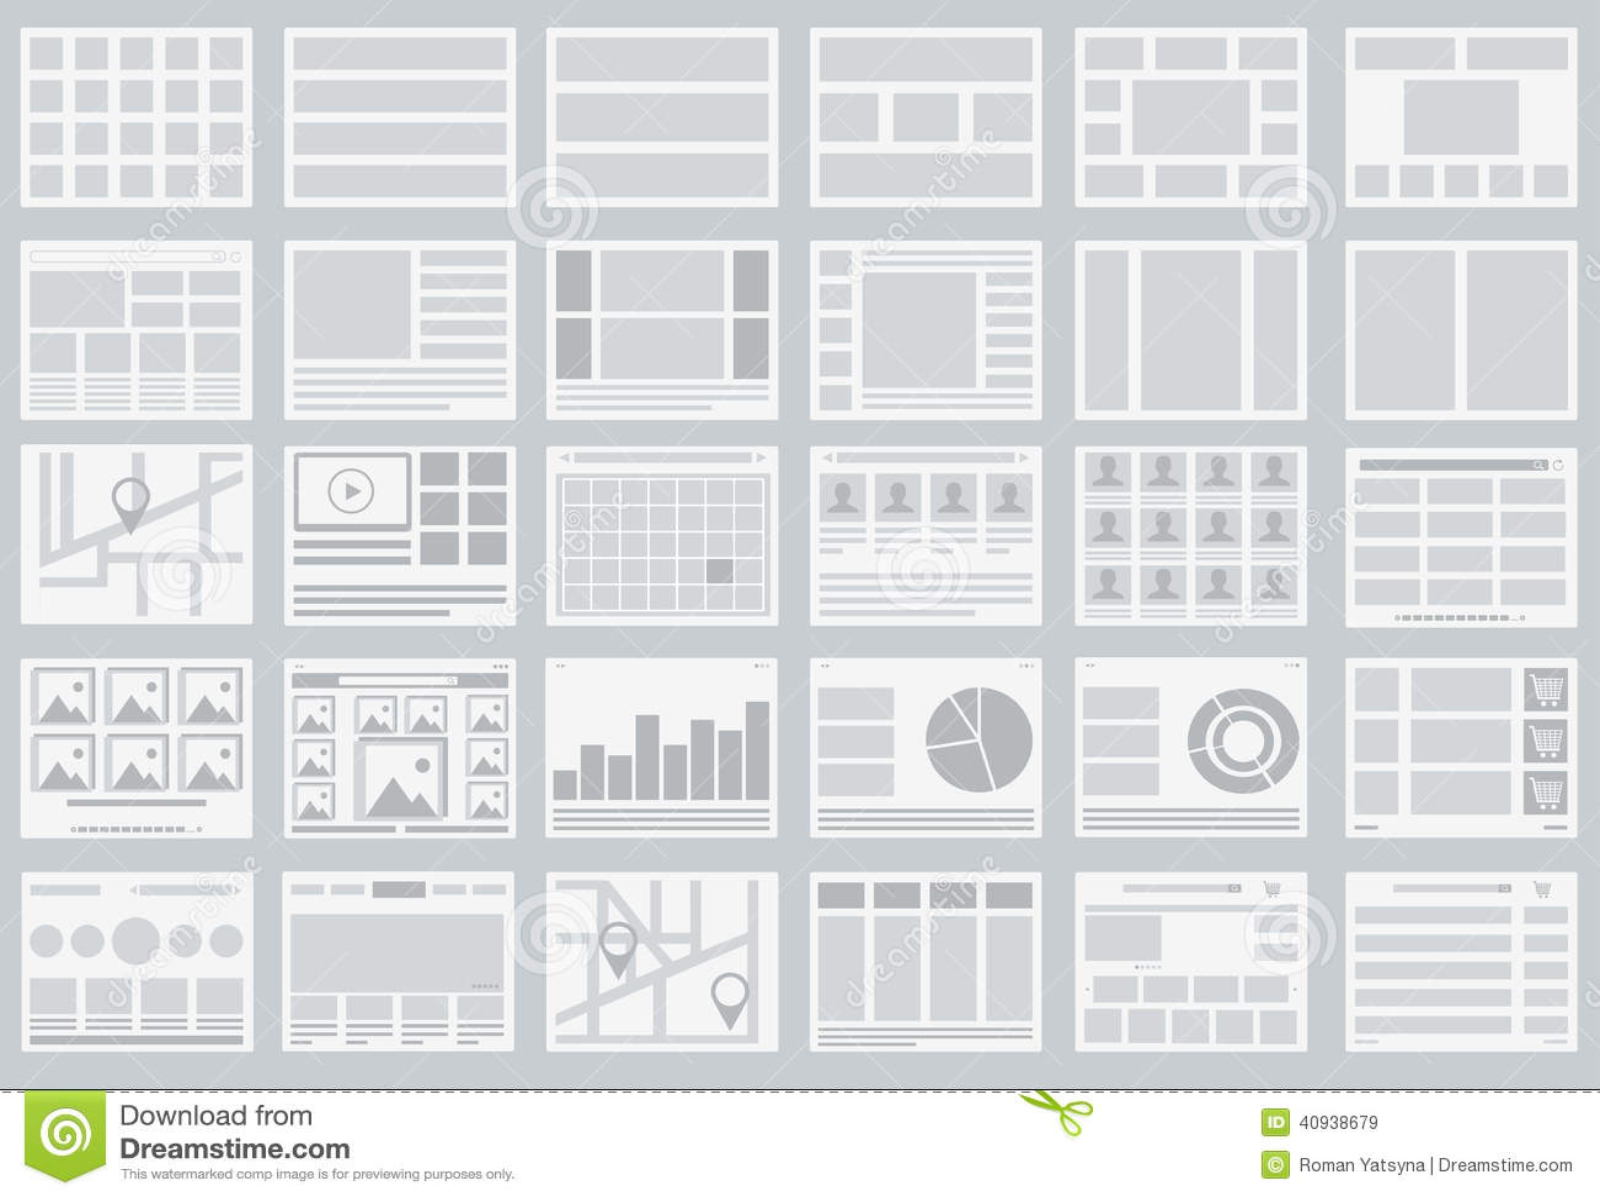 Website Flowcharts, layouts of tabs, infographics, maps